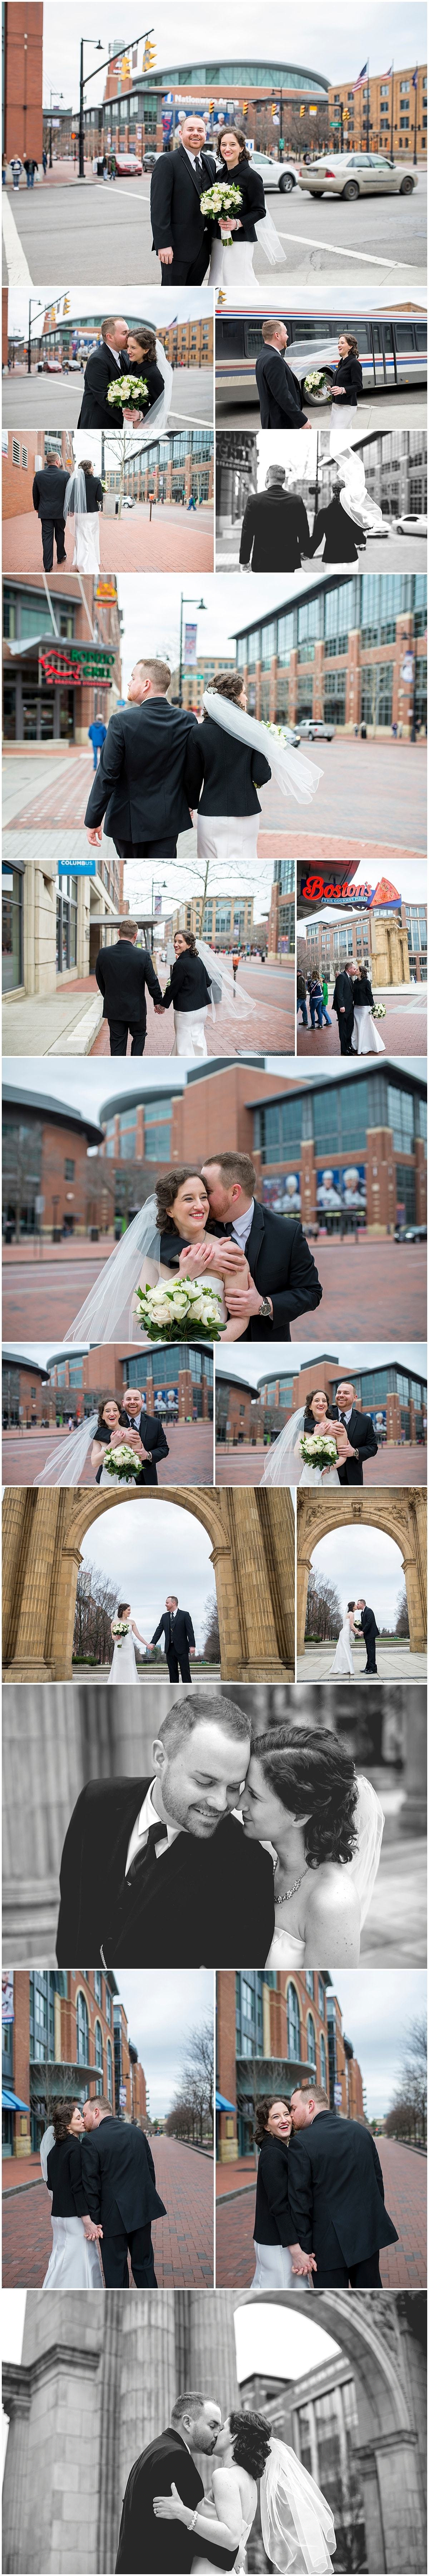 mcferson commons wedding photos